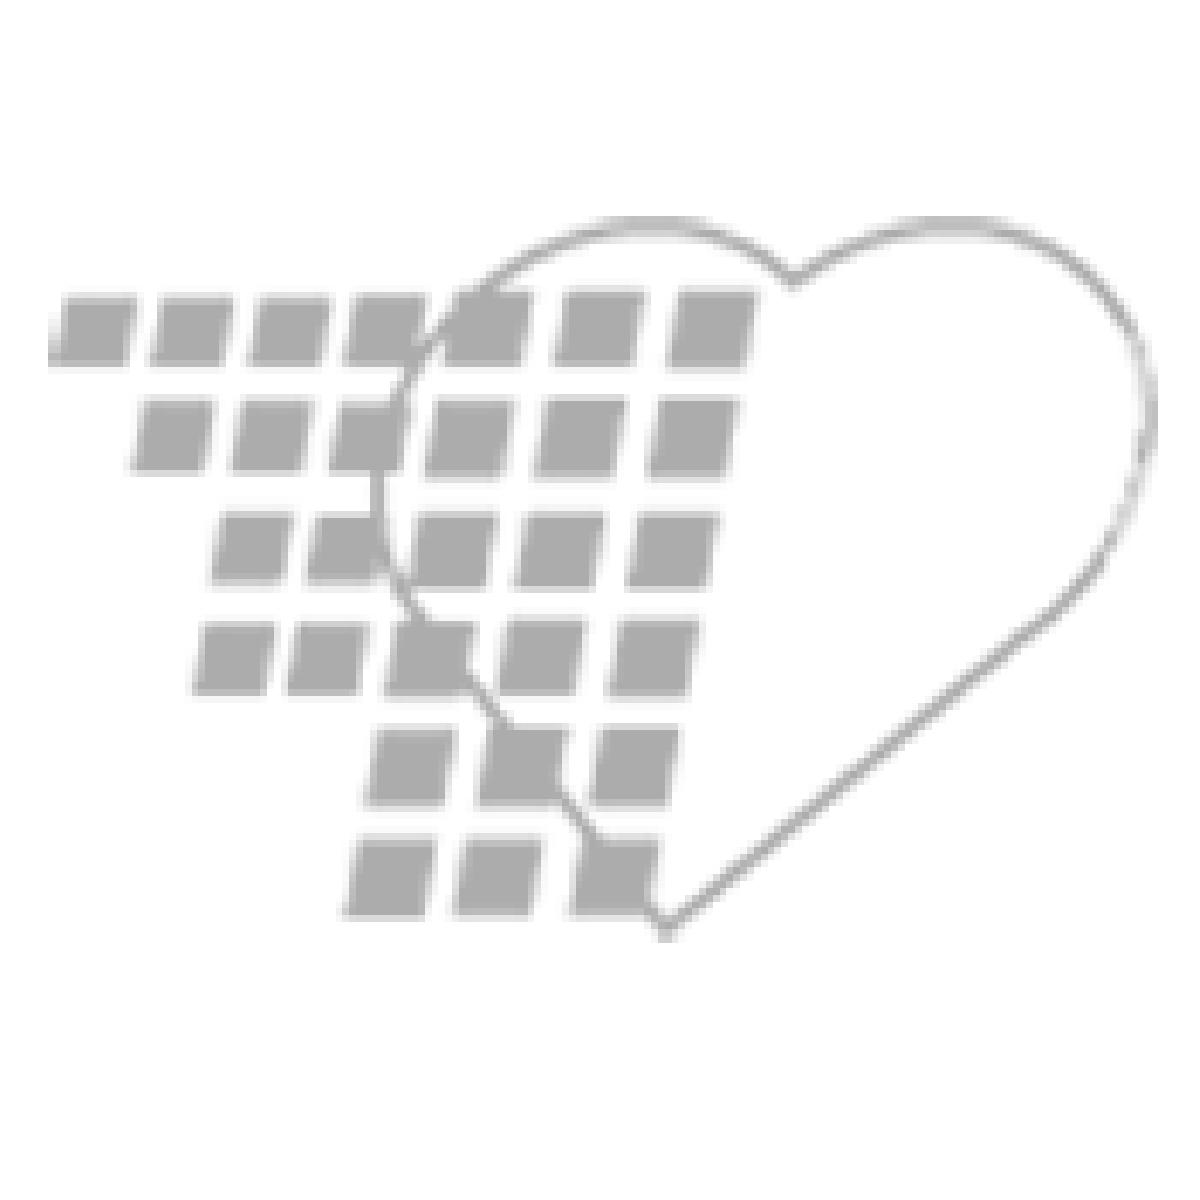 06-93-1108 - Demo Dose® Amiodaron Cordaron 50 mg mL 3 mL